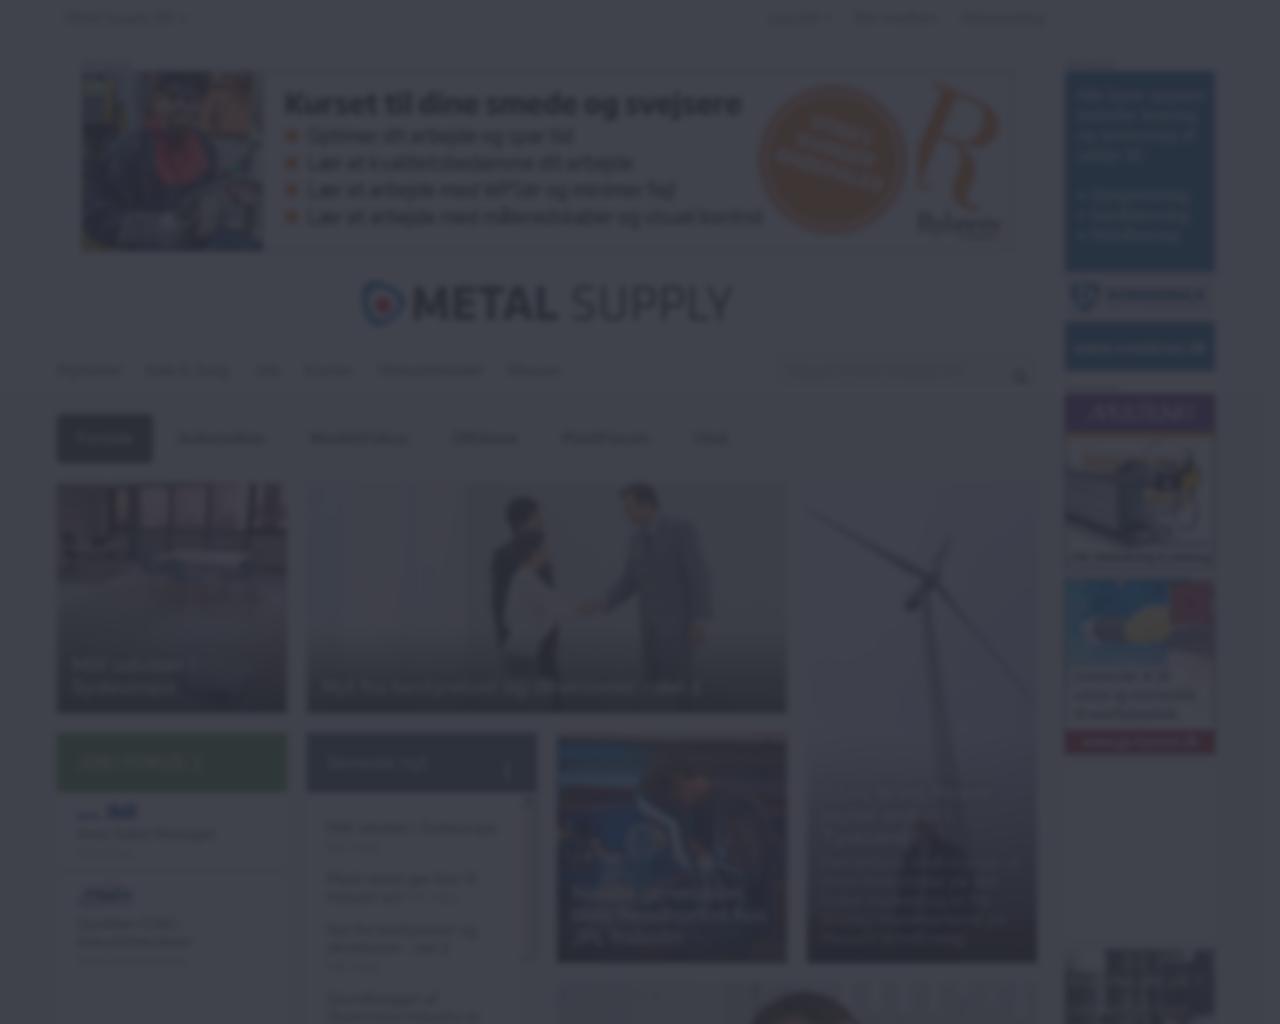 Metal-Supply-Advertising-Reviews-Pricing